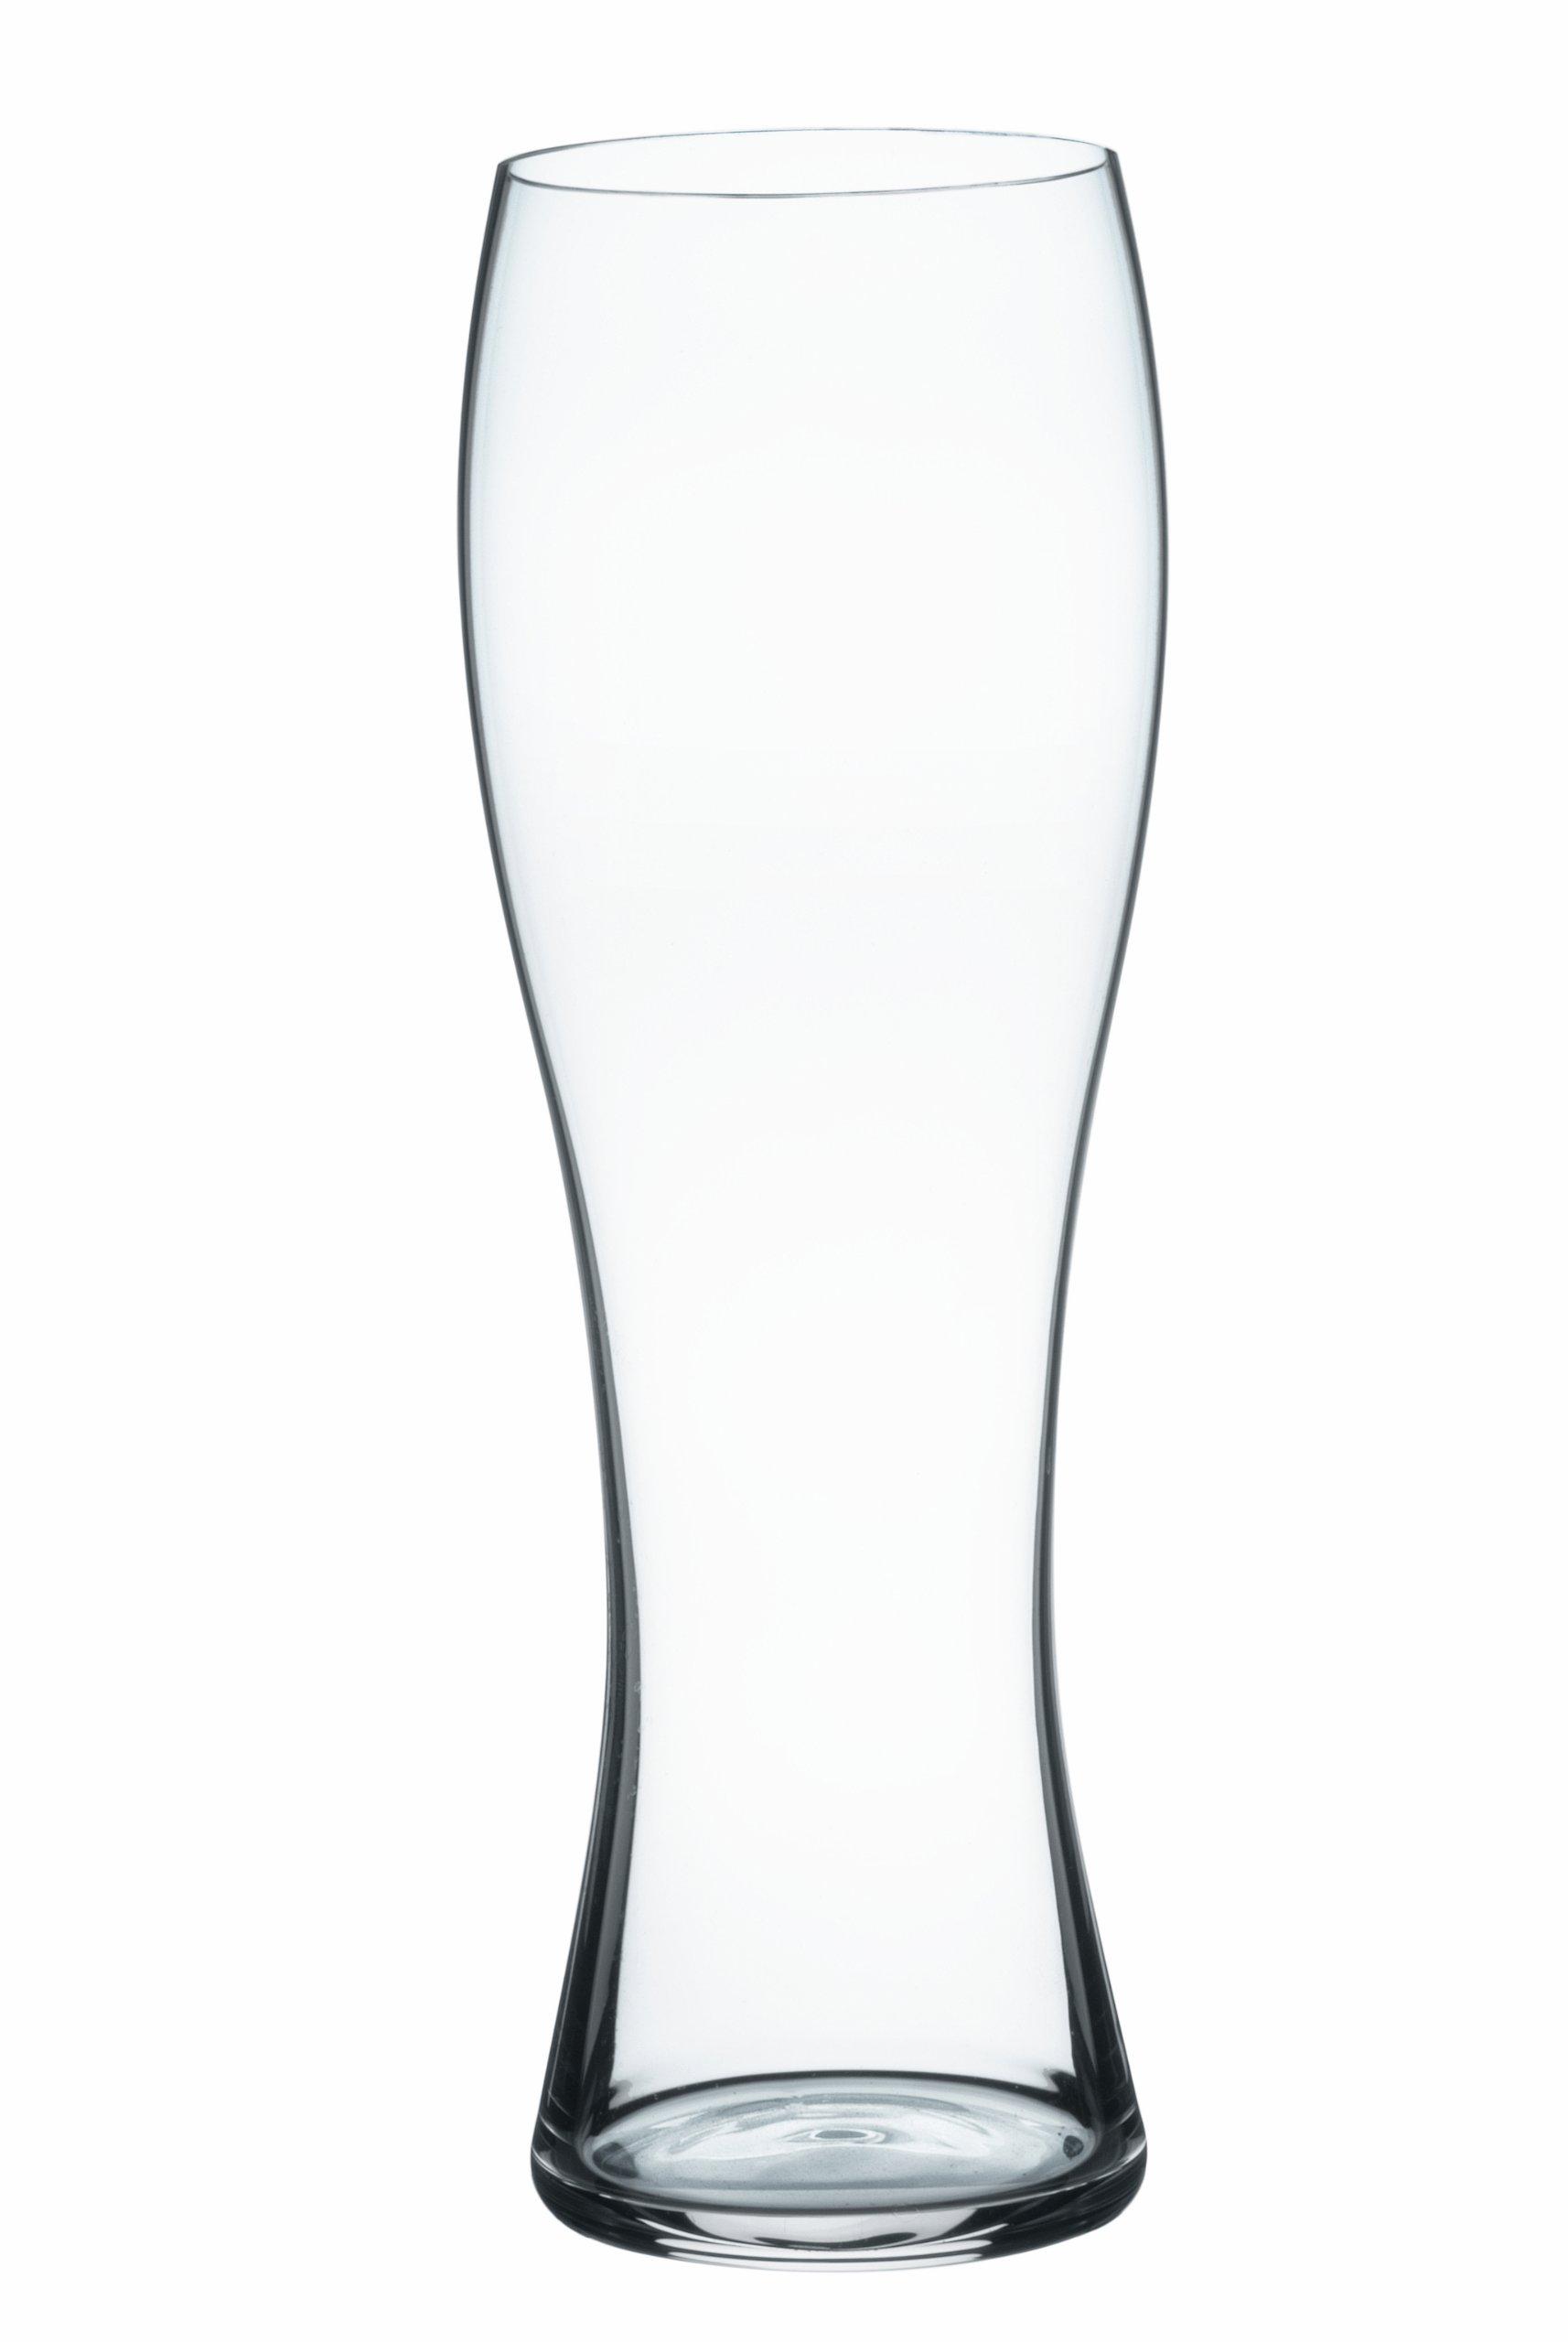 Spiegelau Set of 2 Beer Classics Wheat Beer Glasses